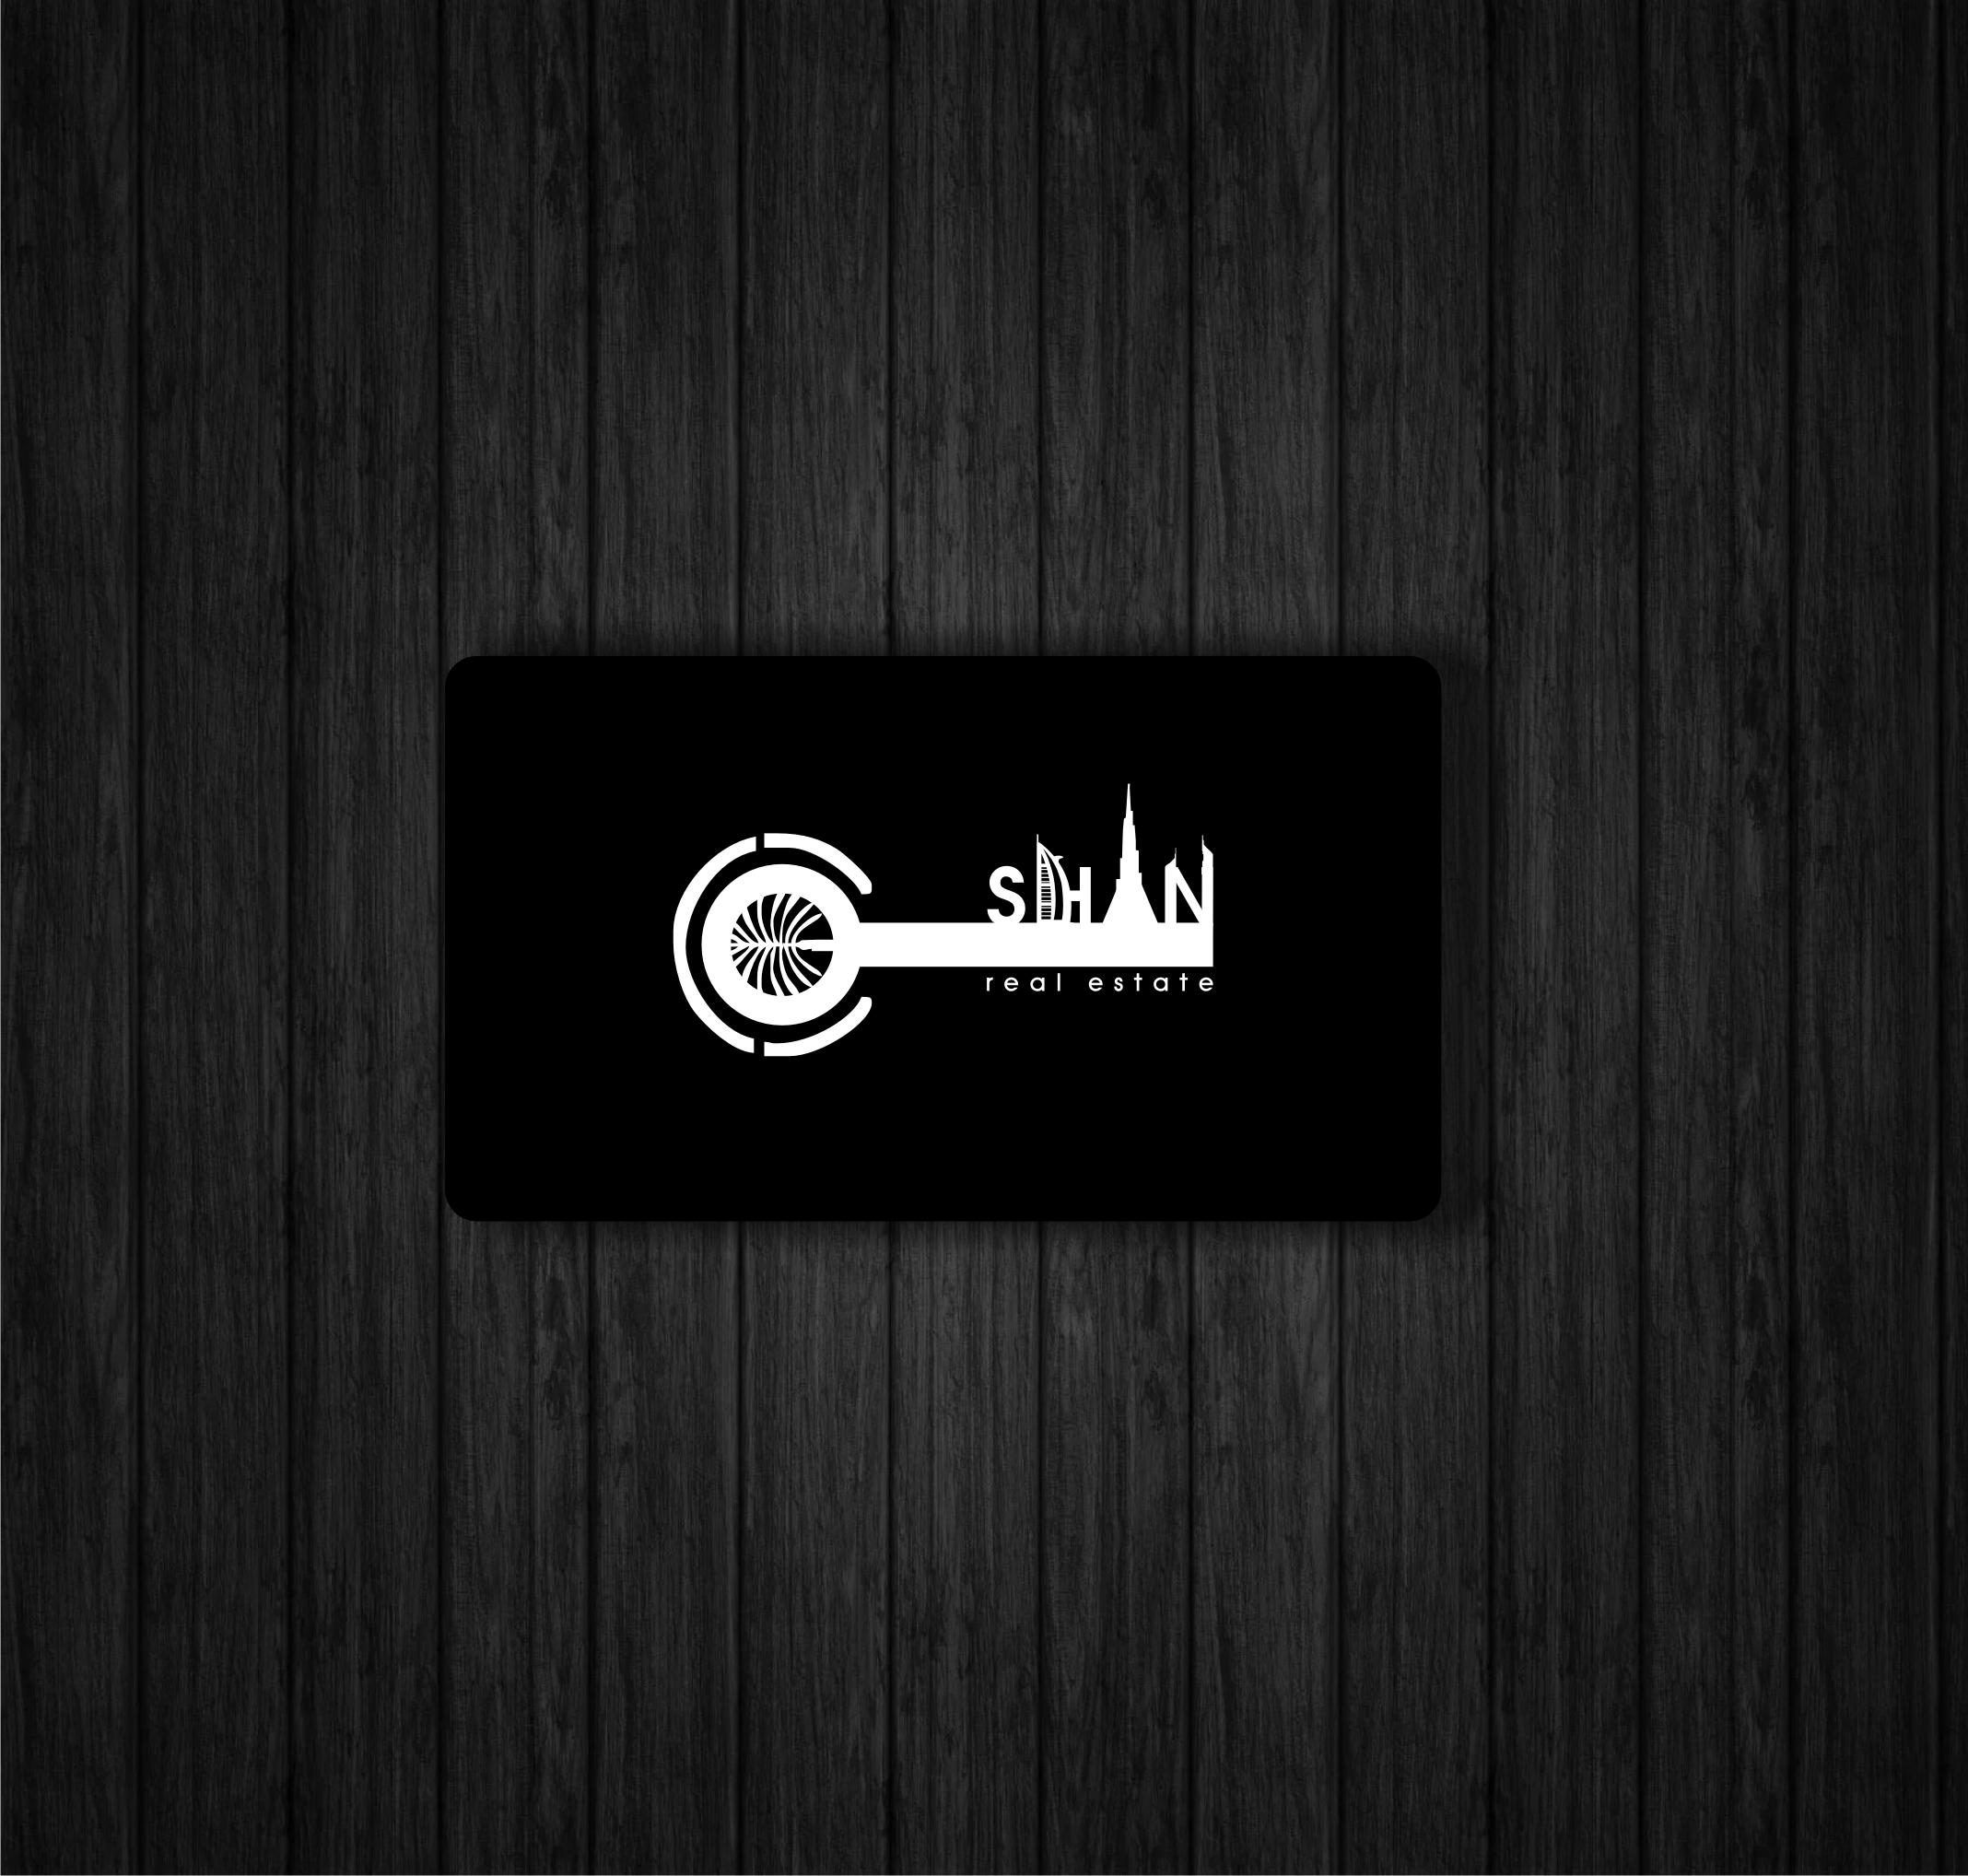 Логотип для агенство недвижемоти ШАН в Эмиратах. фото f_2625b795a227e674.jpg